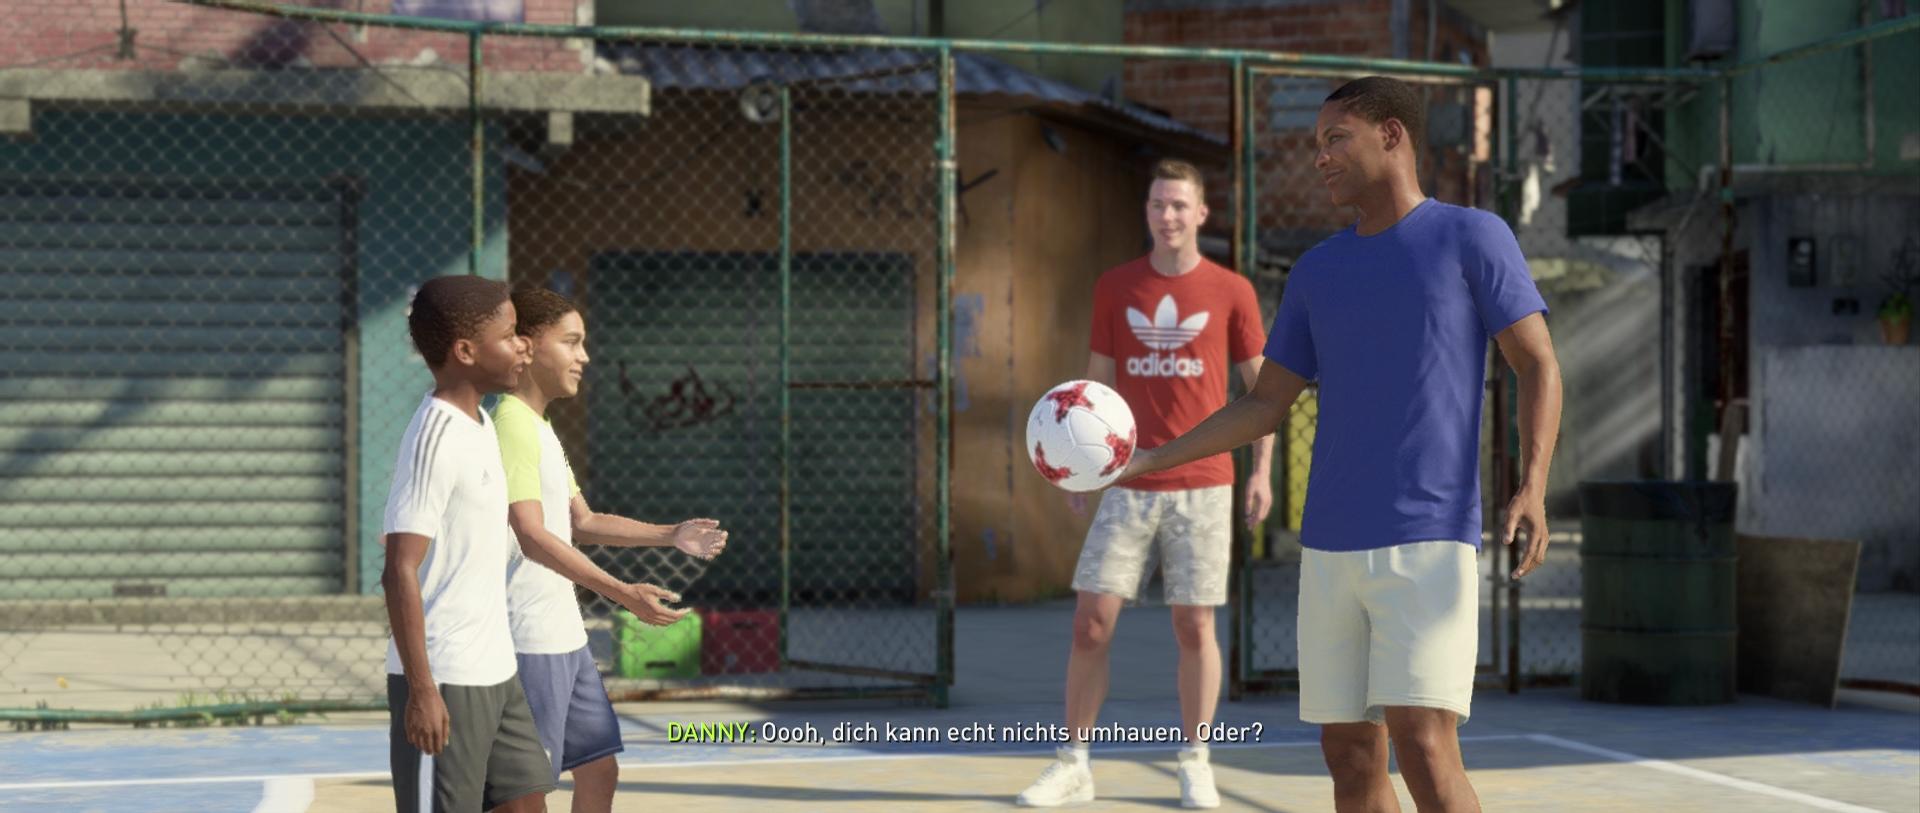 Fifa 18 Test Storymodus The Journey Hunter Returns Spielmechanik